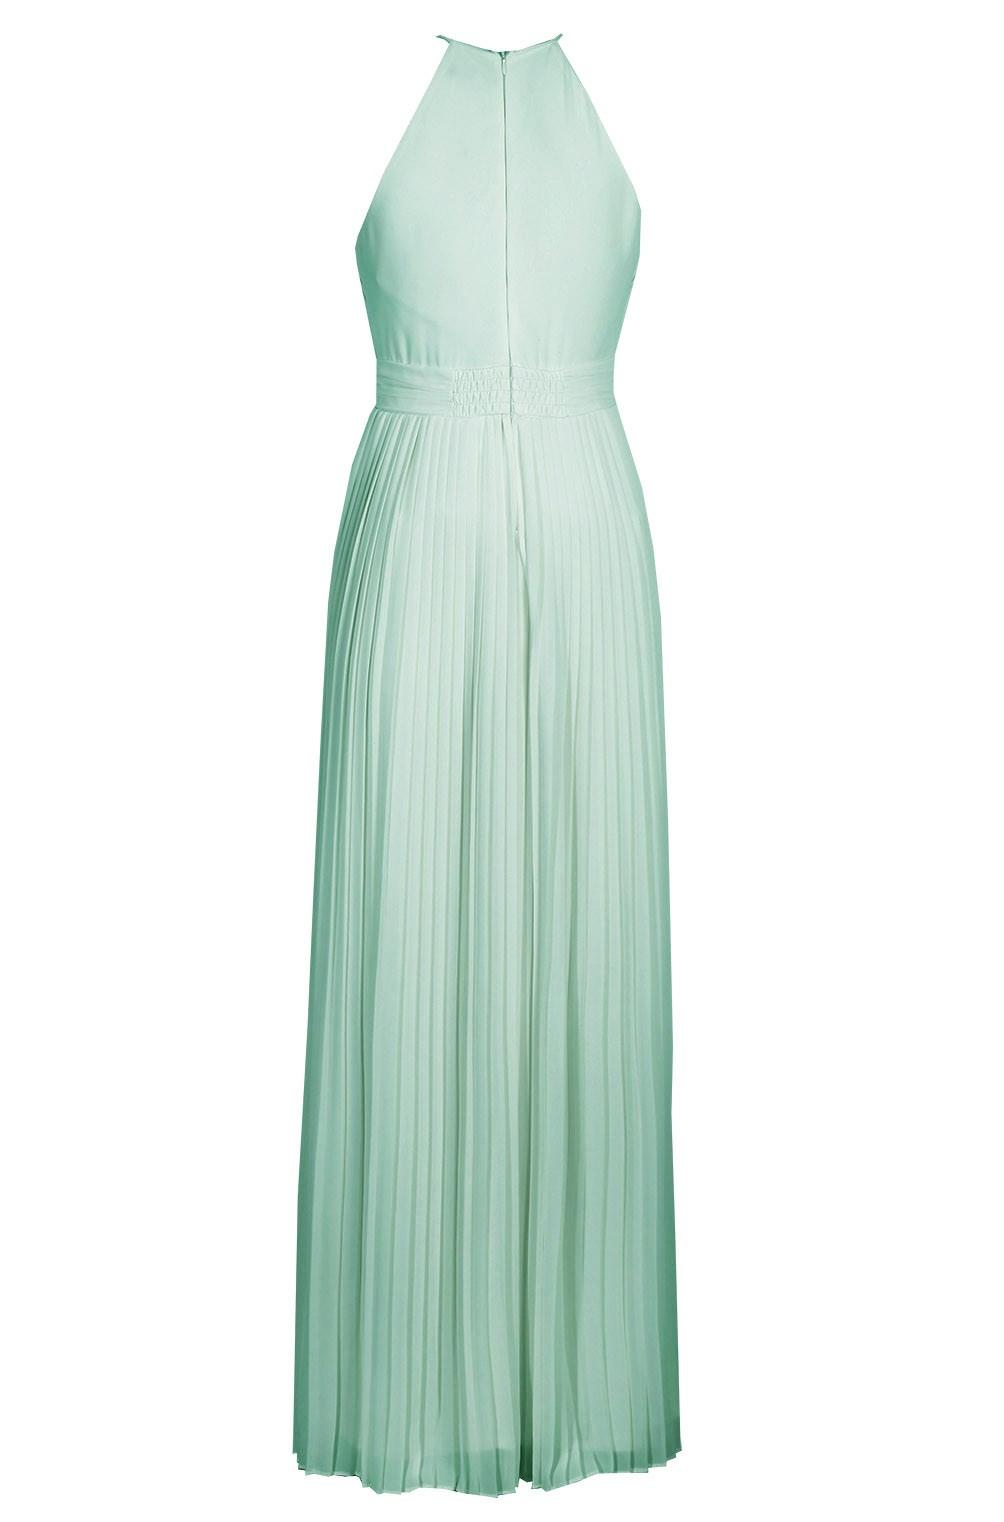 Tfnc Serene Mint Maxi Dress Tfnc Party Dresses